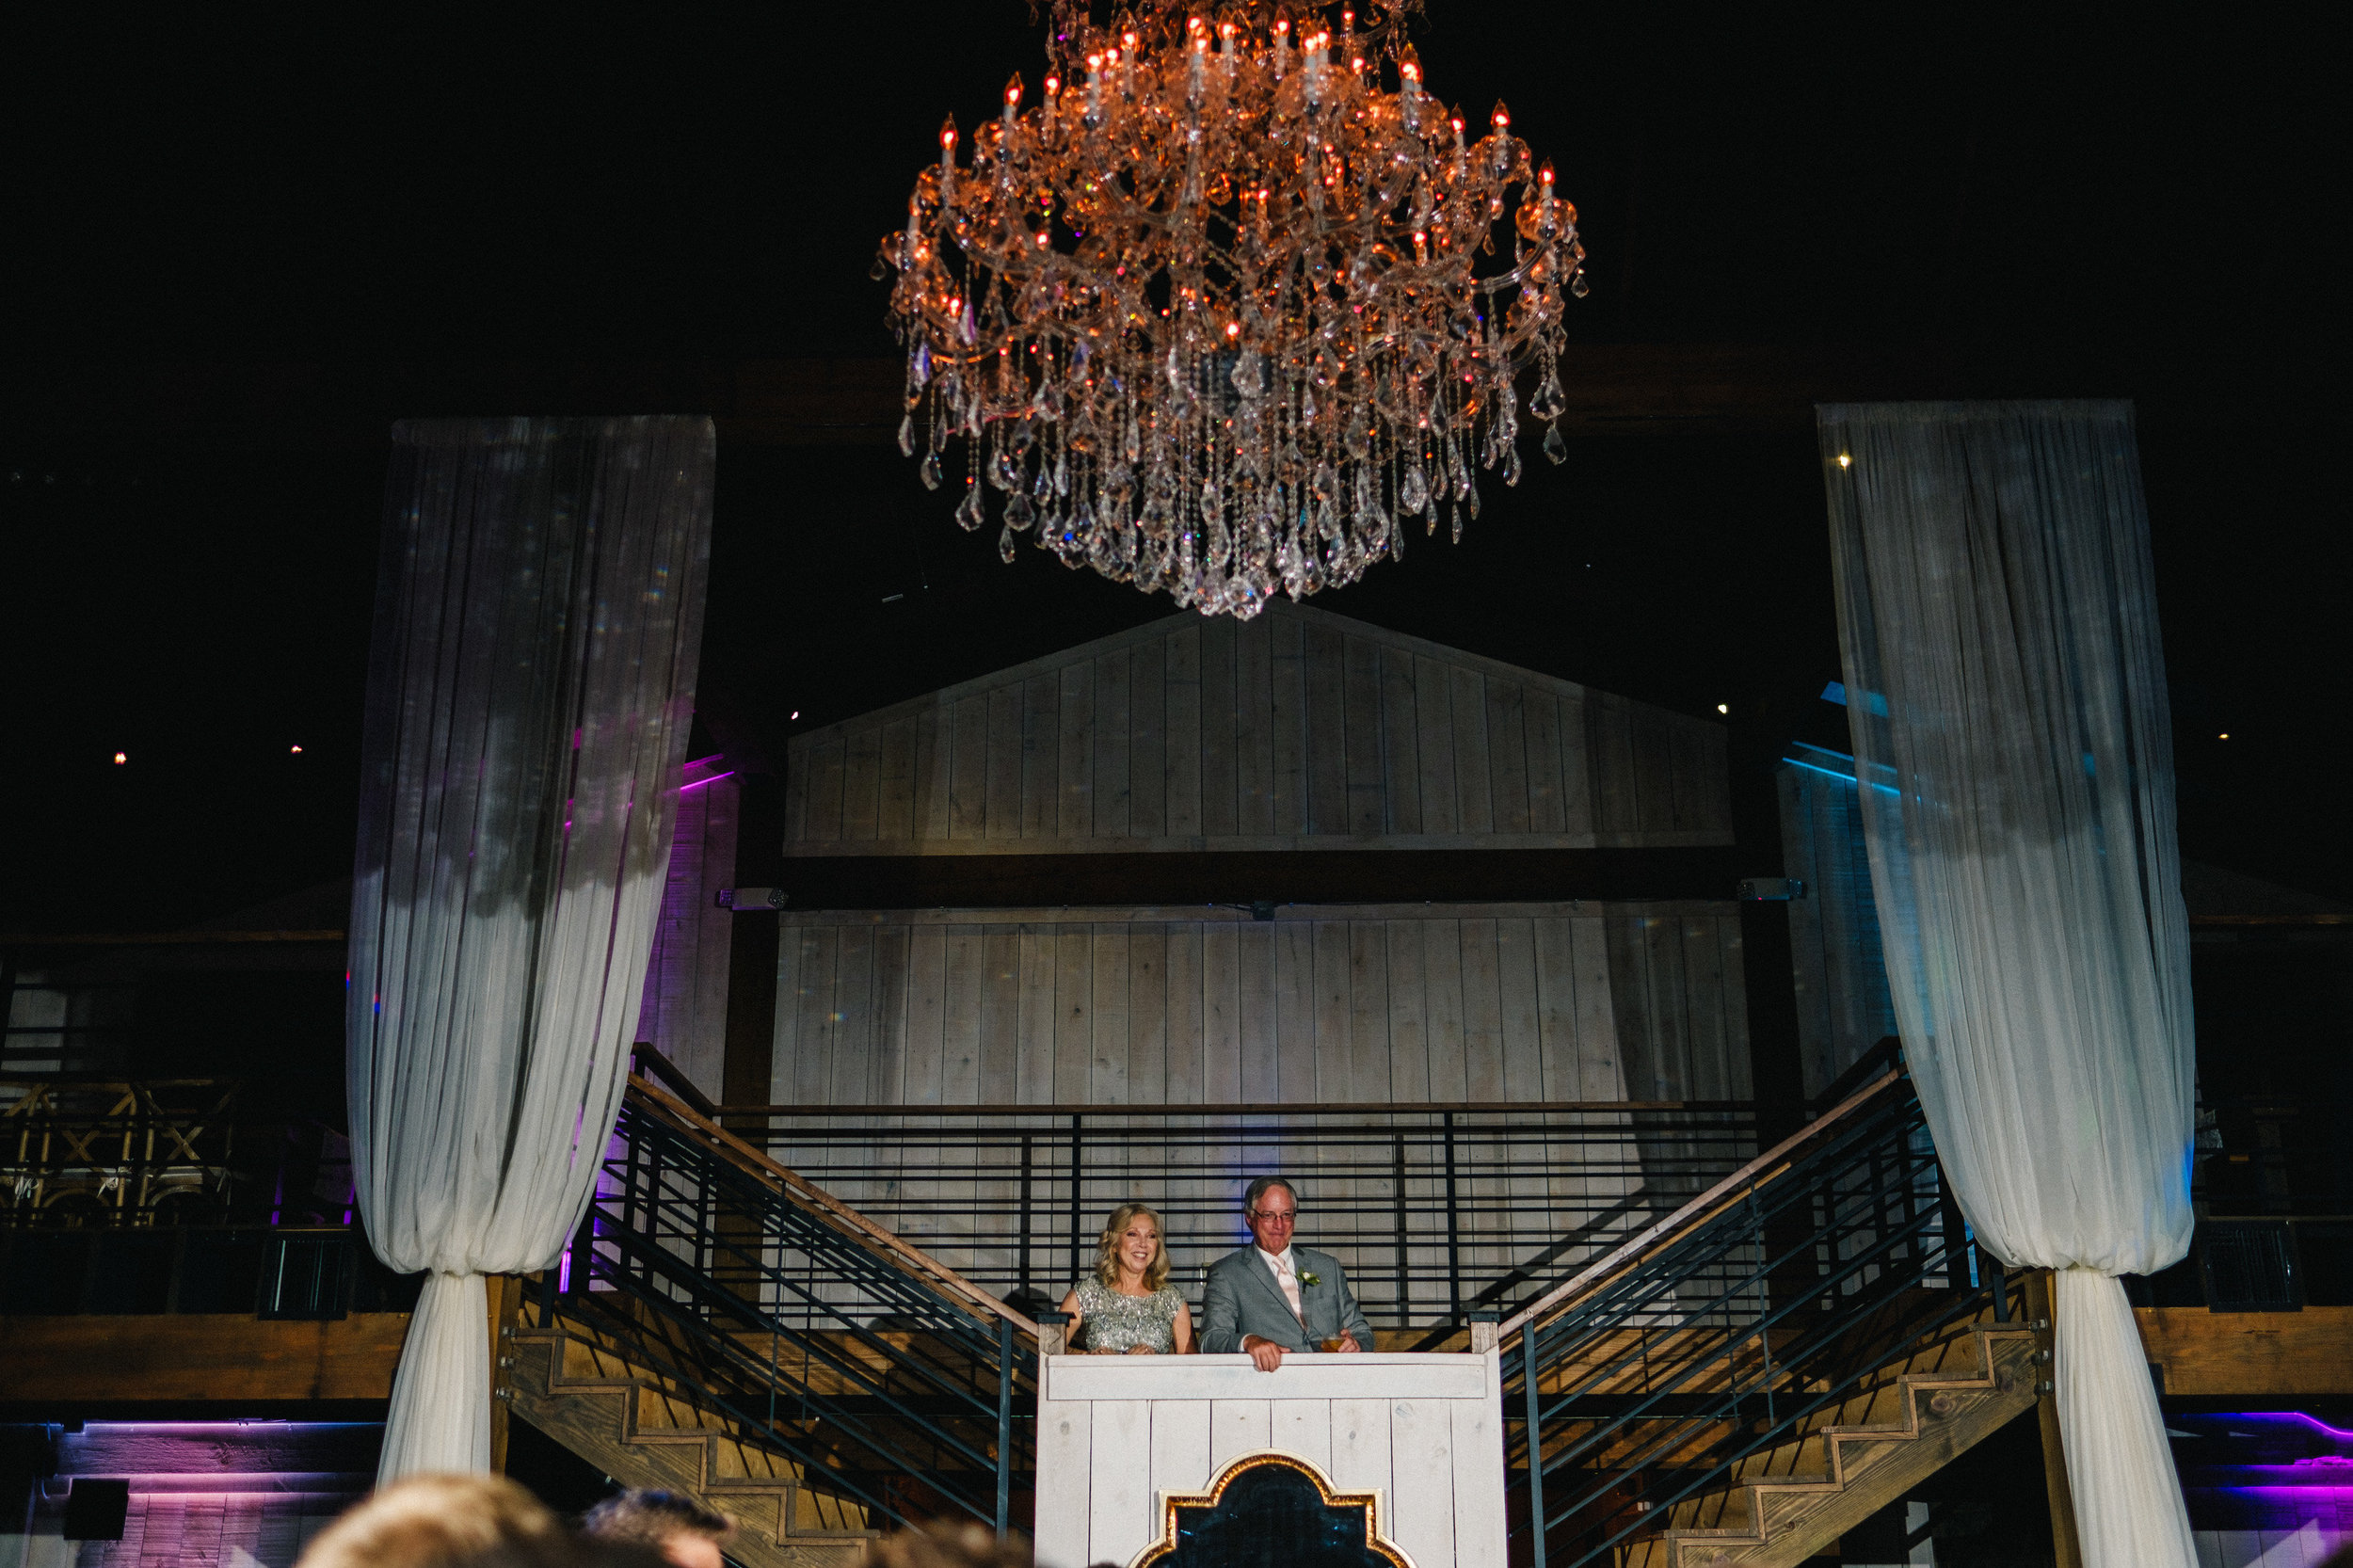 Nashville_Wedding_Photography_Mint_Springs_79.jpg